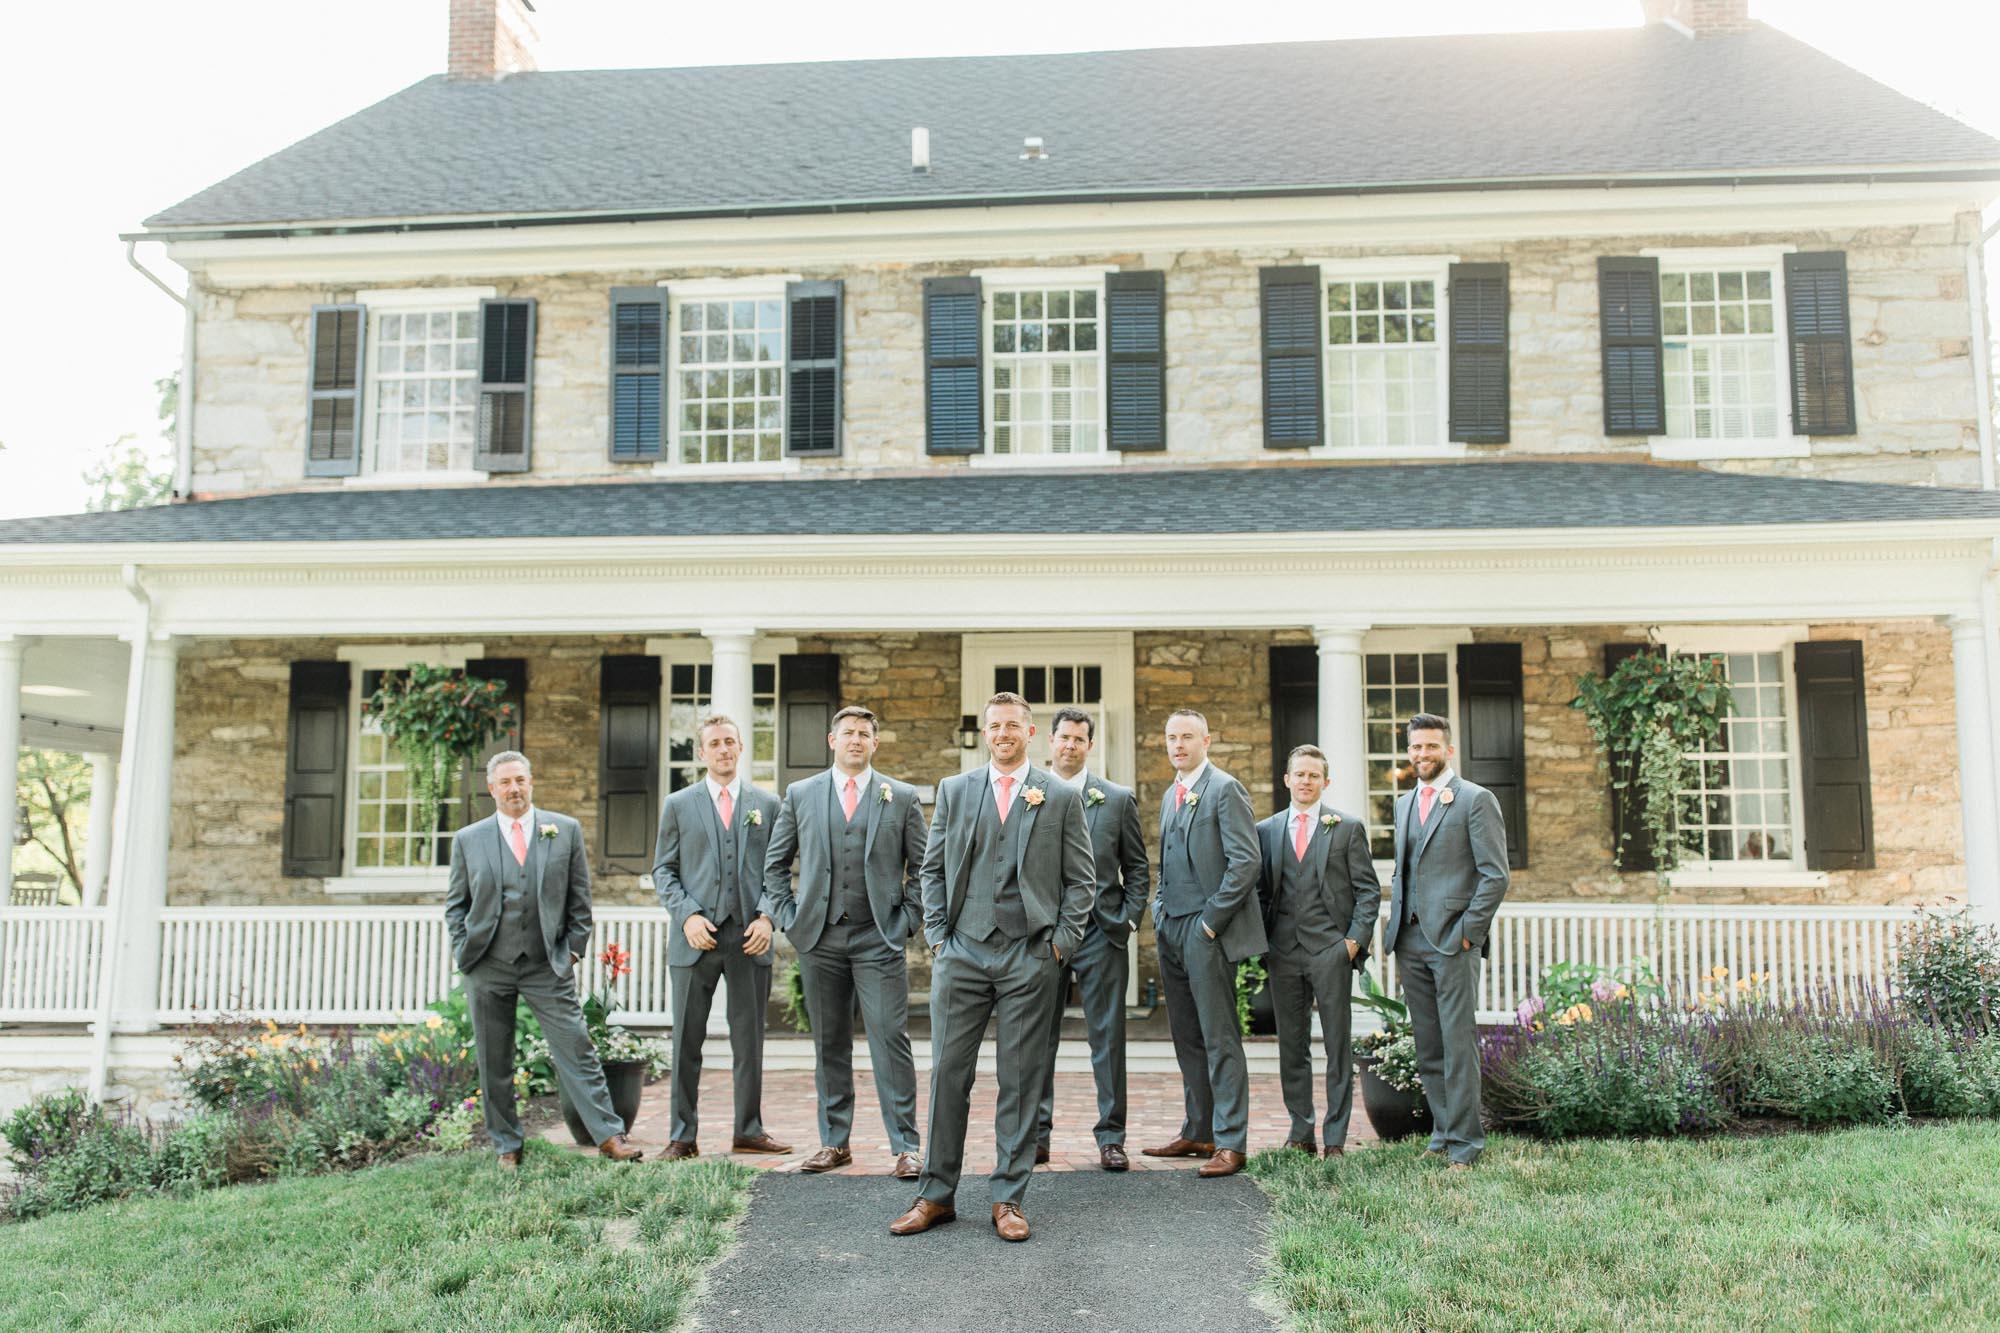 Allenberry-resort-historic-pennsylvania-wedding-10112.jpg